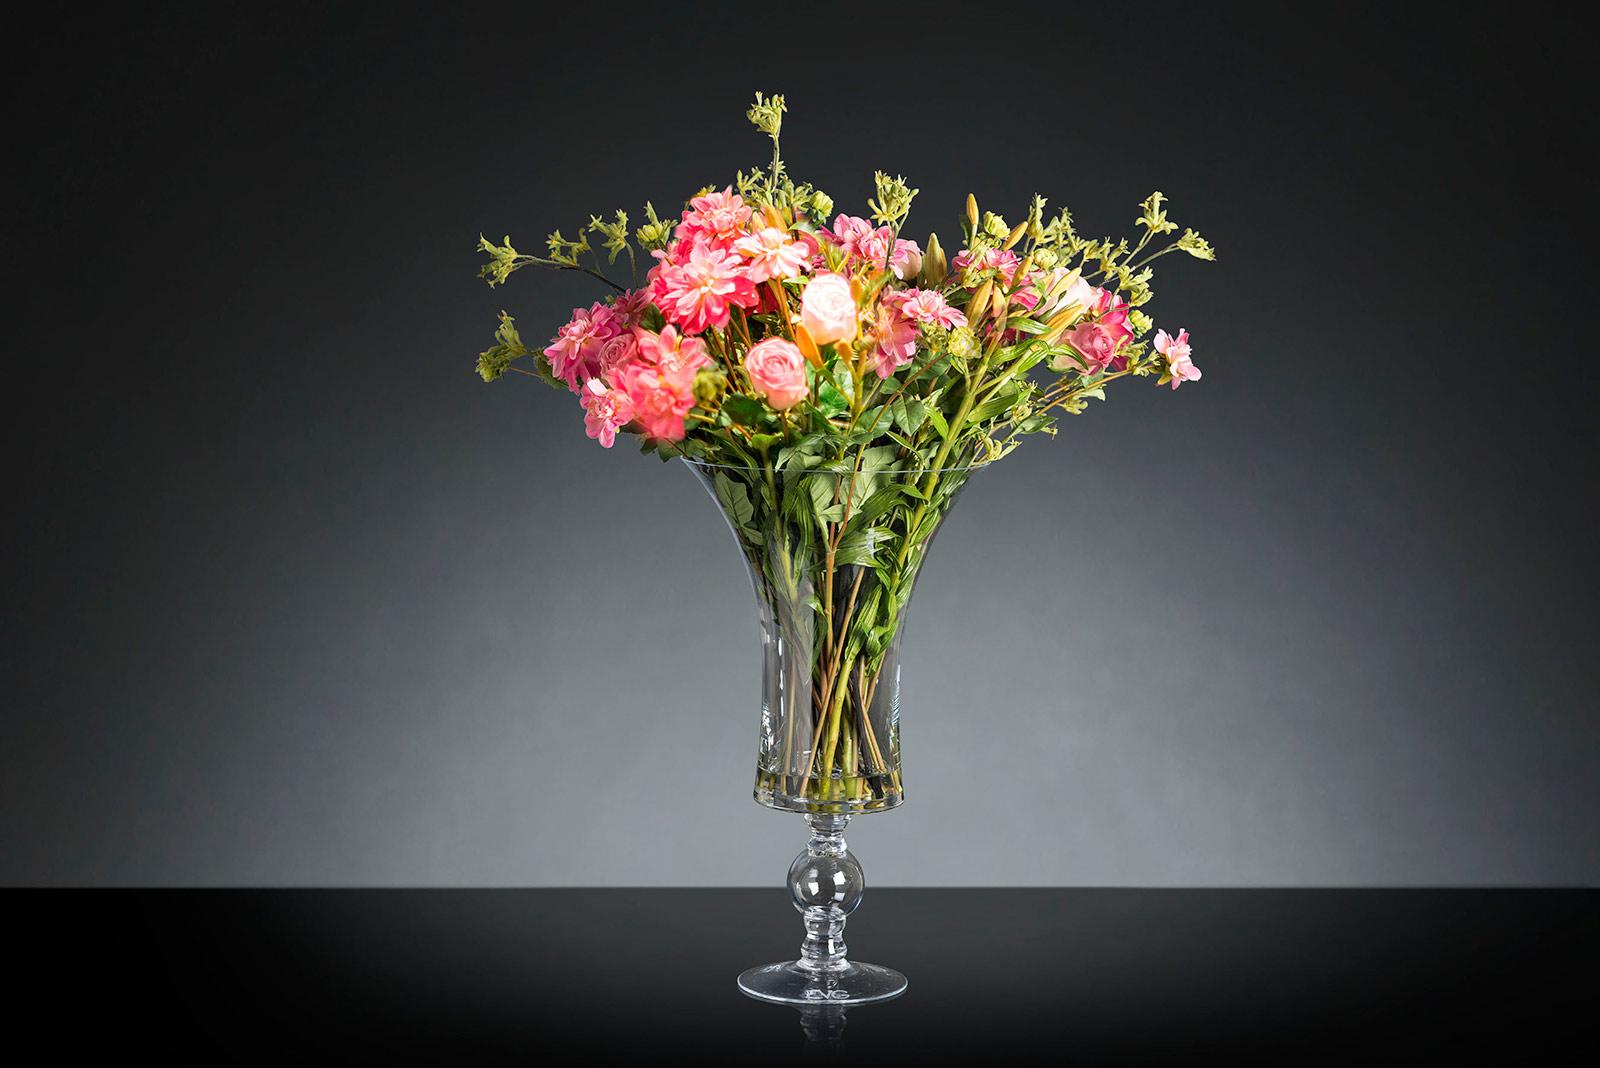 Ginevra flower arrangement by VG New Trend - Masha Shapiro Agency.jpg